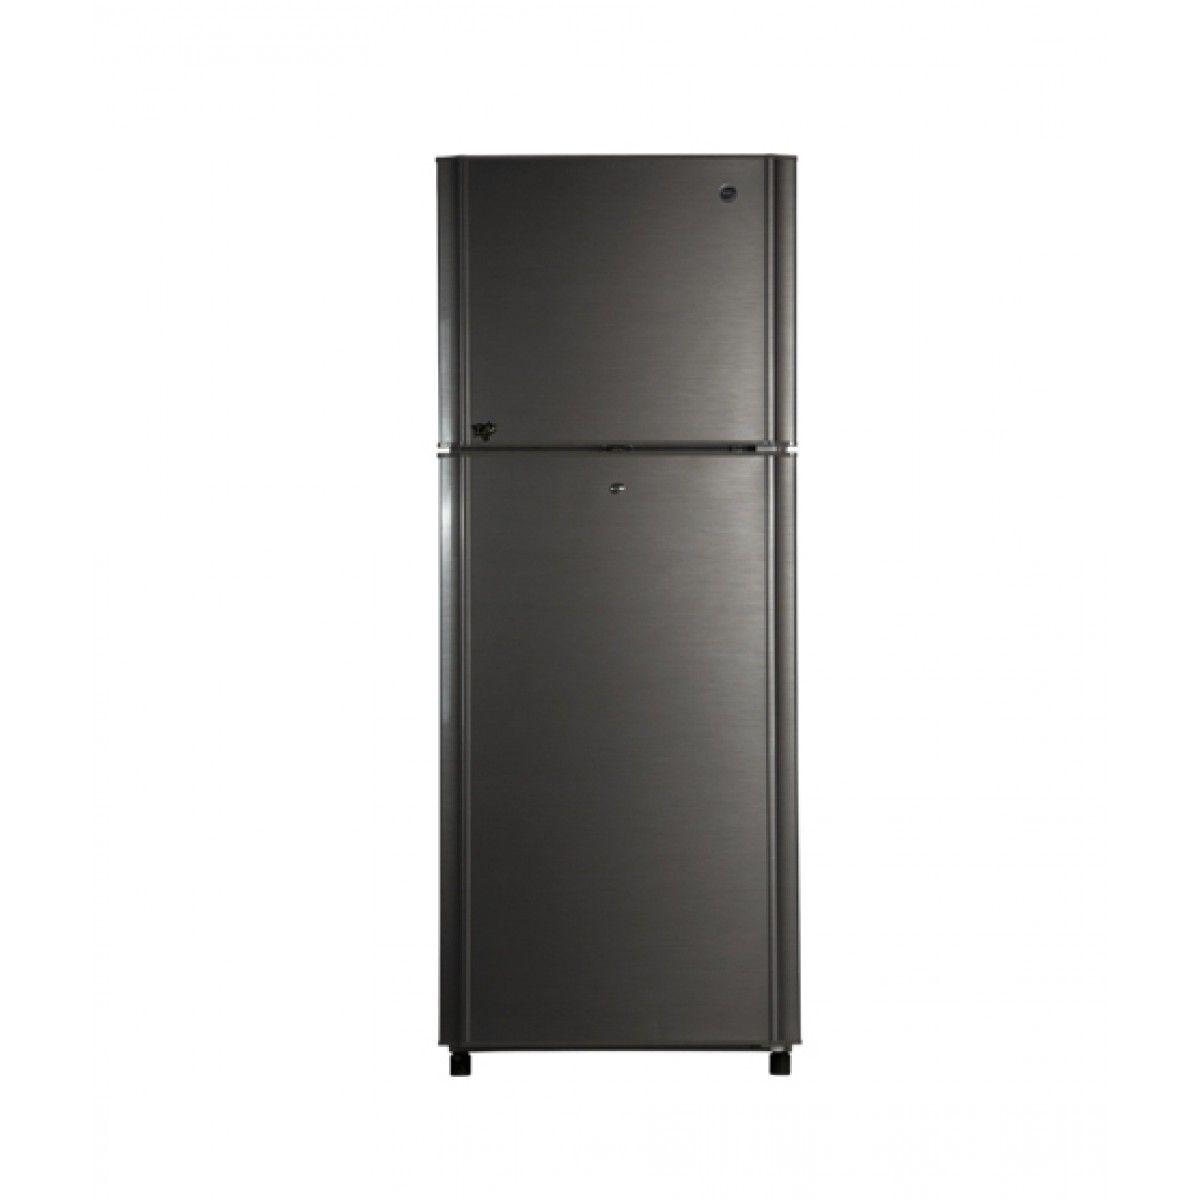 PEL PRL-22250 16 Cu Ft  Refrigerator